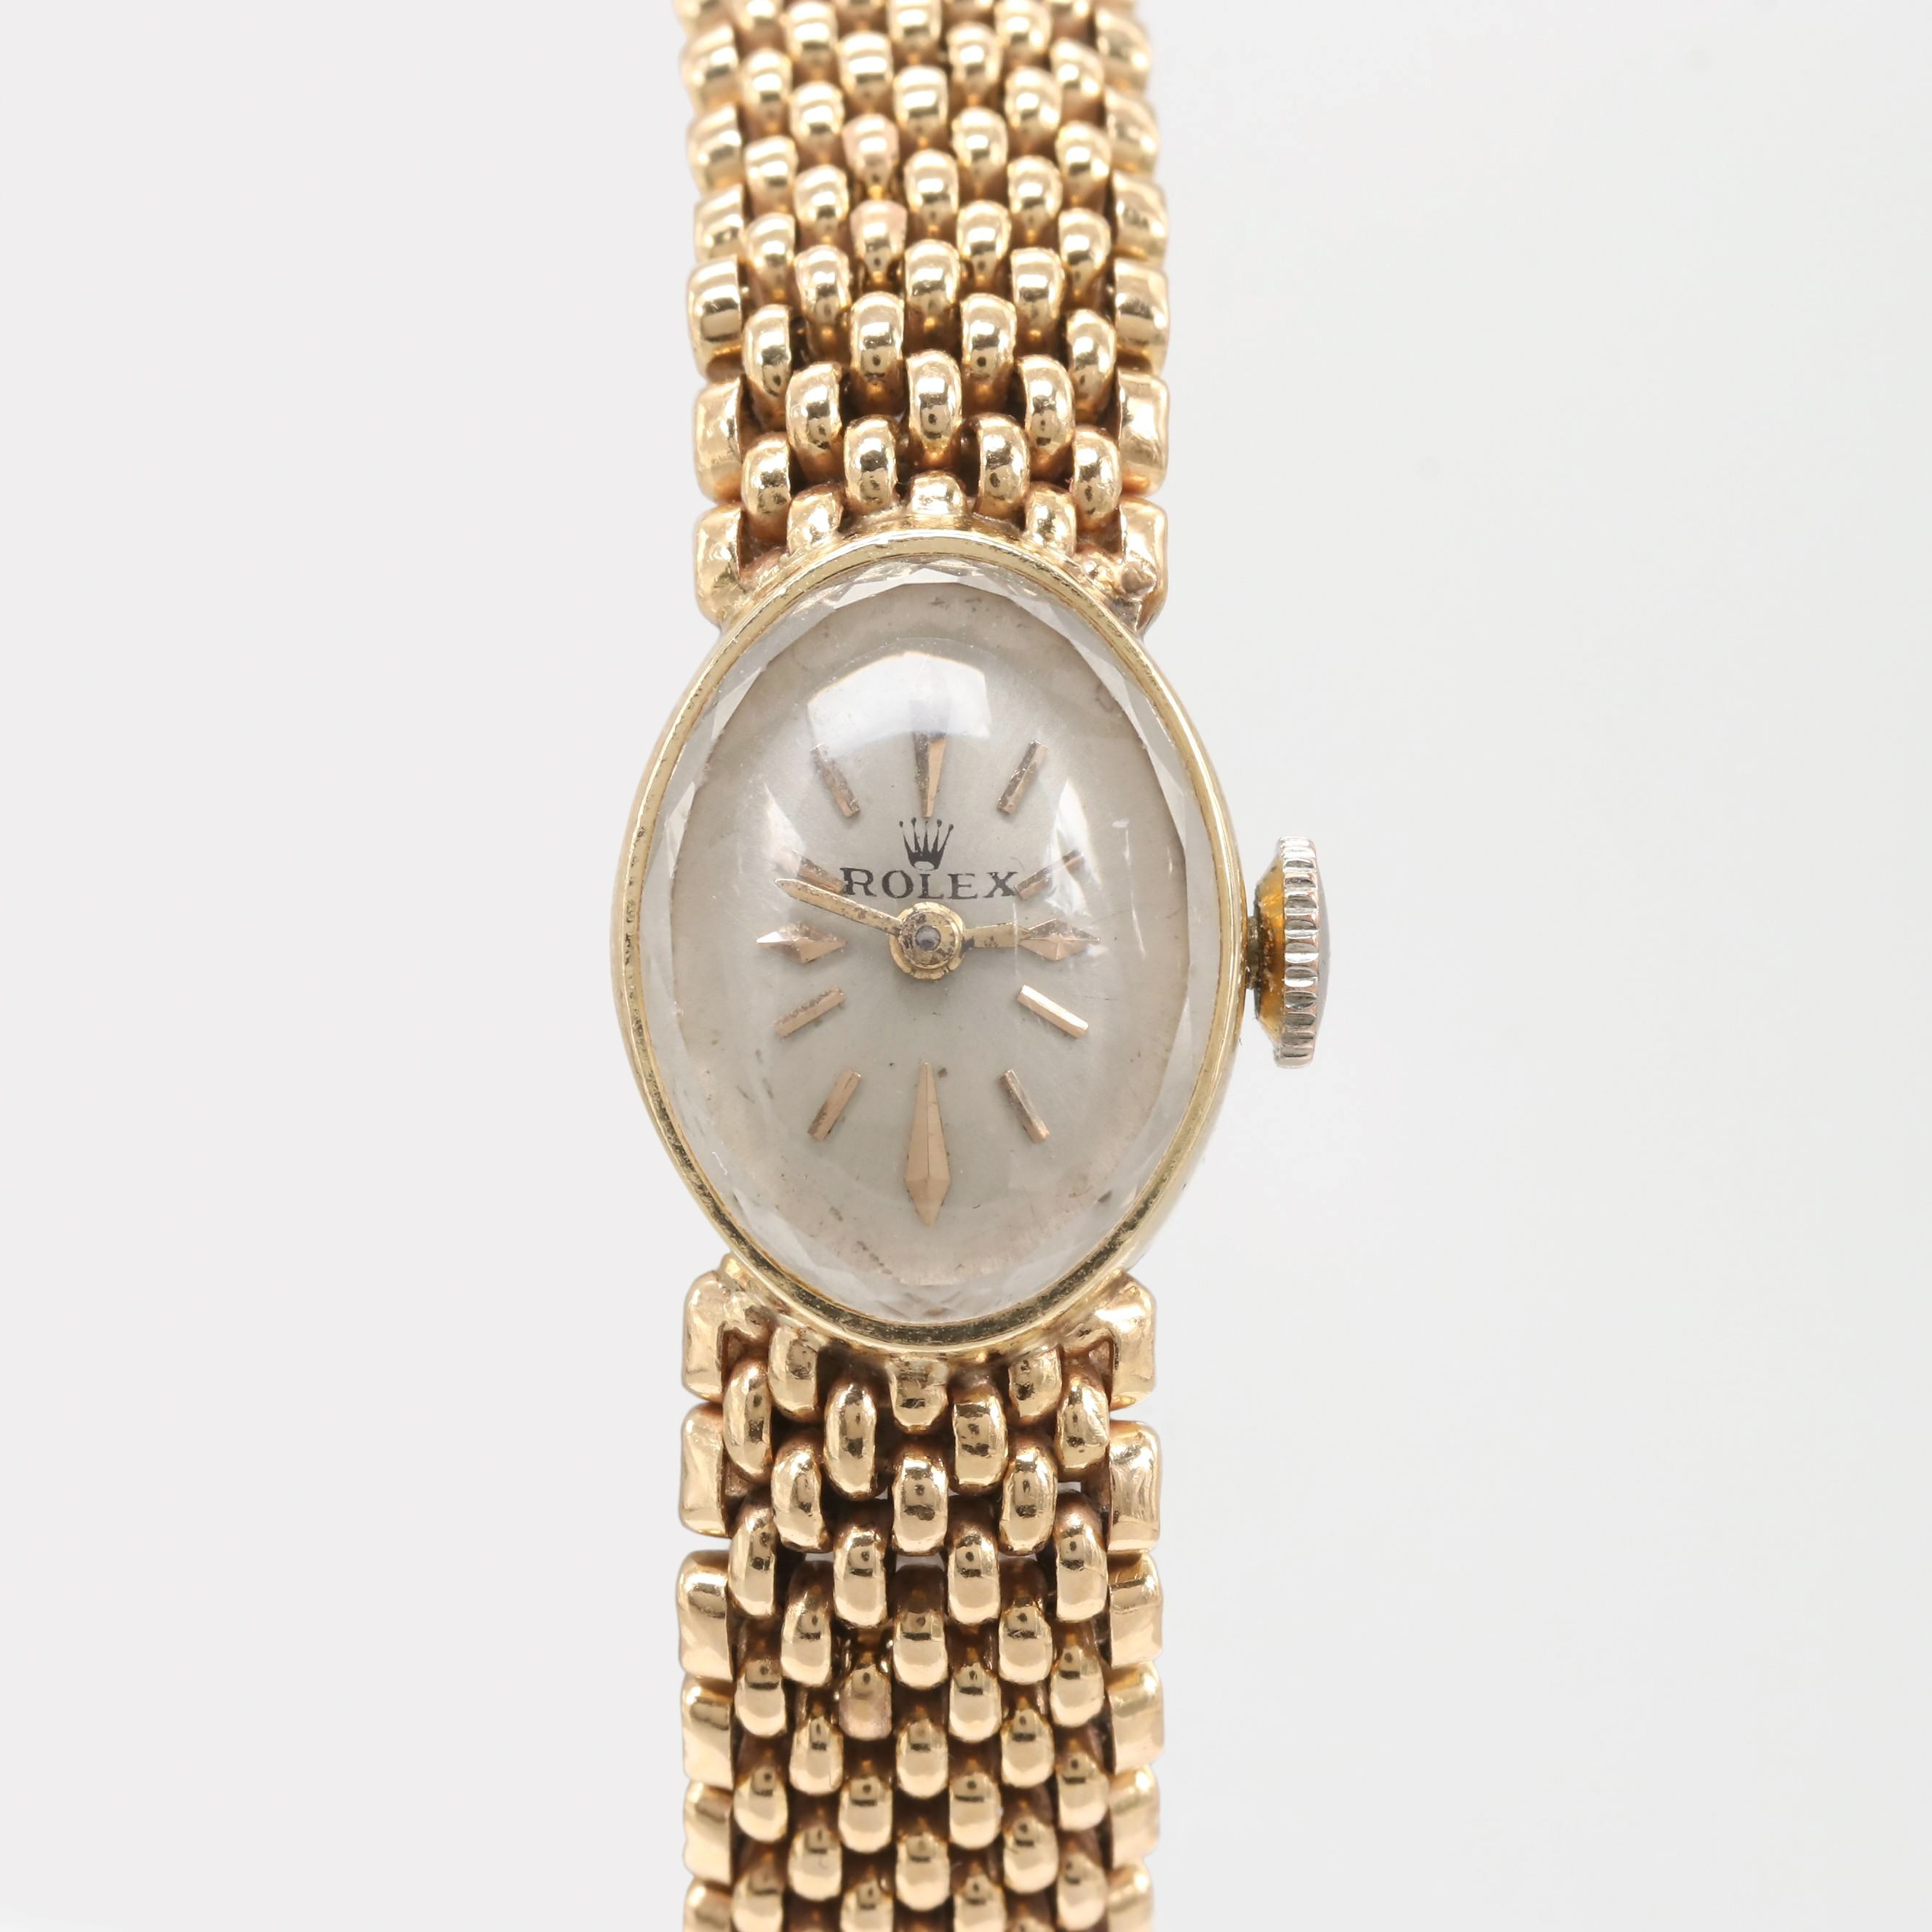 Vintage Rolex 14K Yellow Gold Stem Wind Wristwatch on Panther Link Bracelet